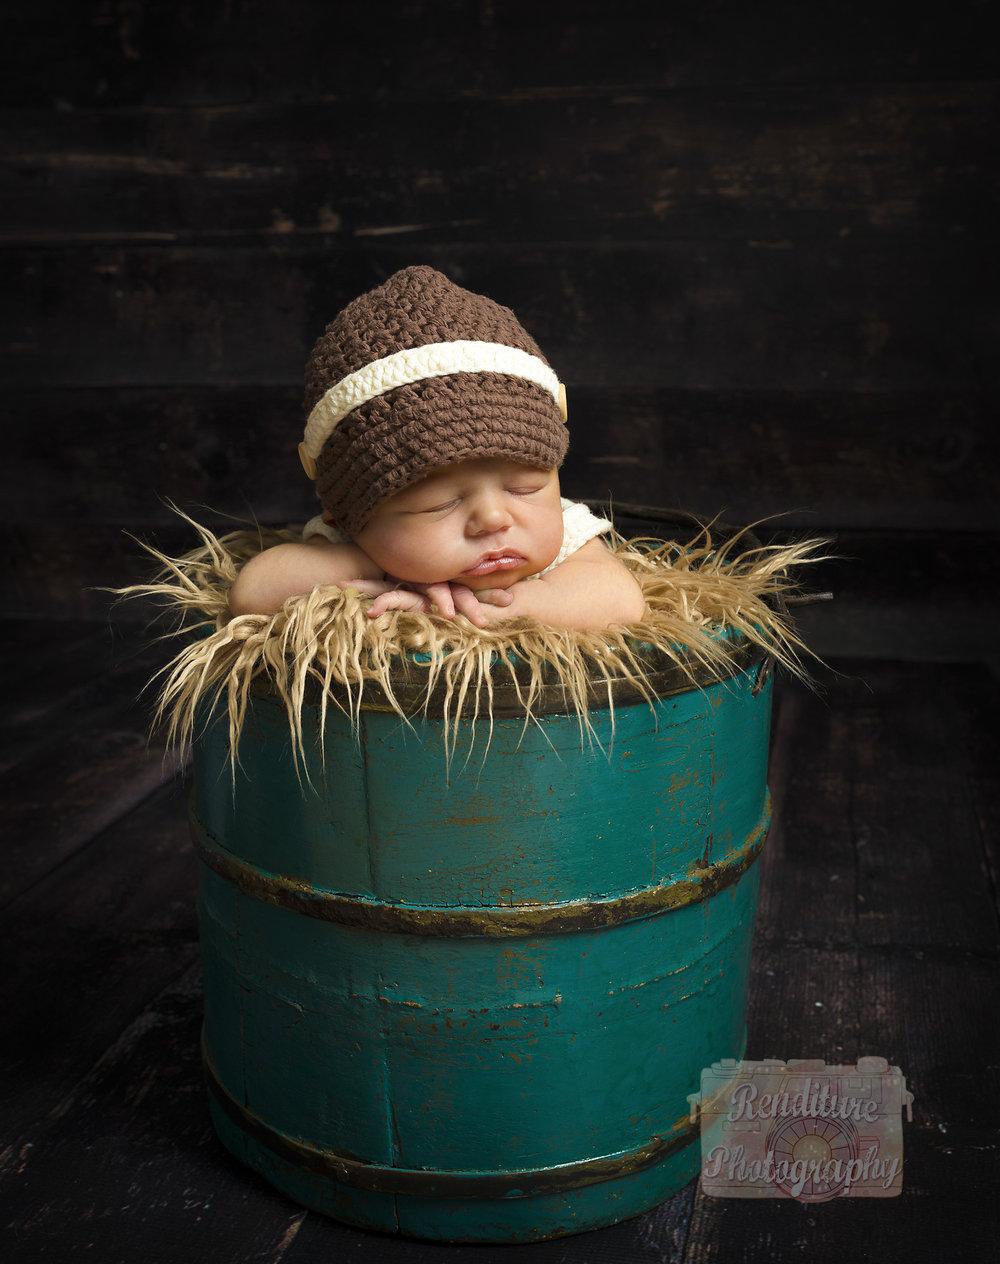 Saskatoon,Newborn,Photographer,Baby,Photography,Photographer,Maternity,Pregnancy,Family, Renditure,Child,Infant,Tot,Kid,Photos,Saskatchewan,YXE,SK